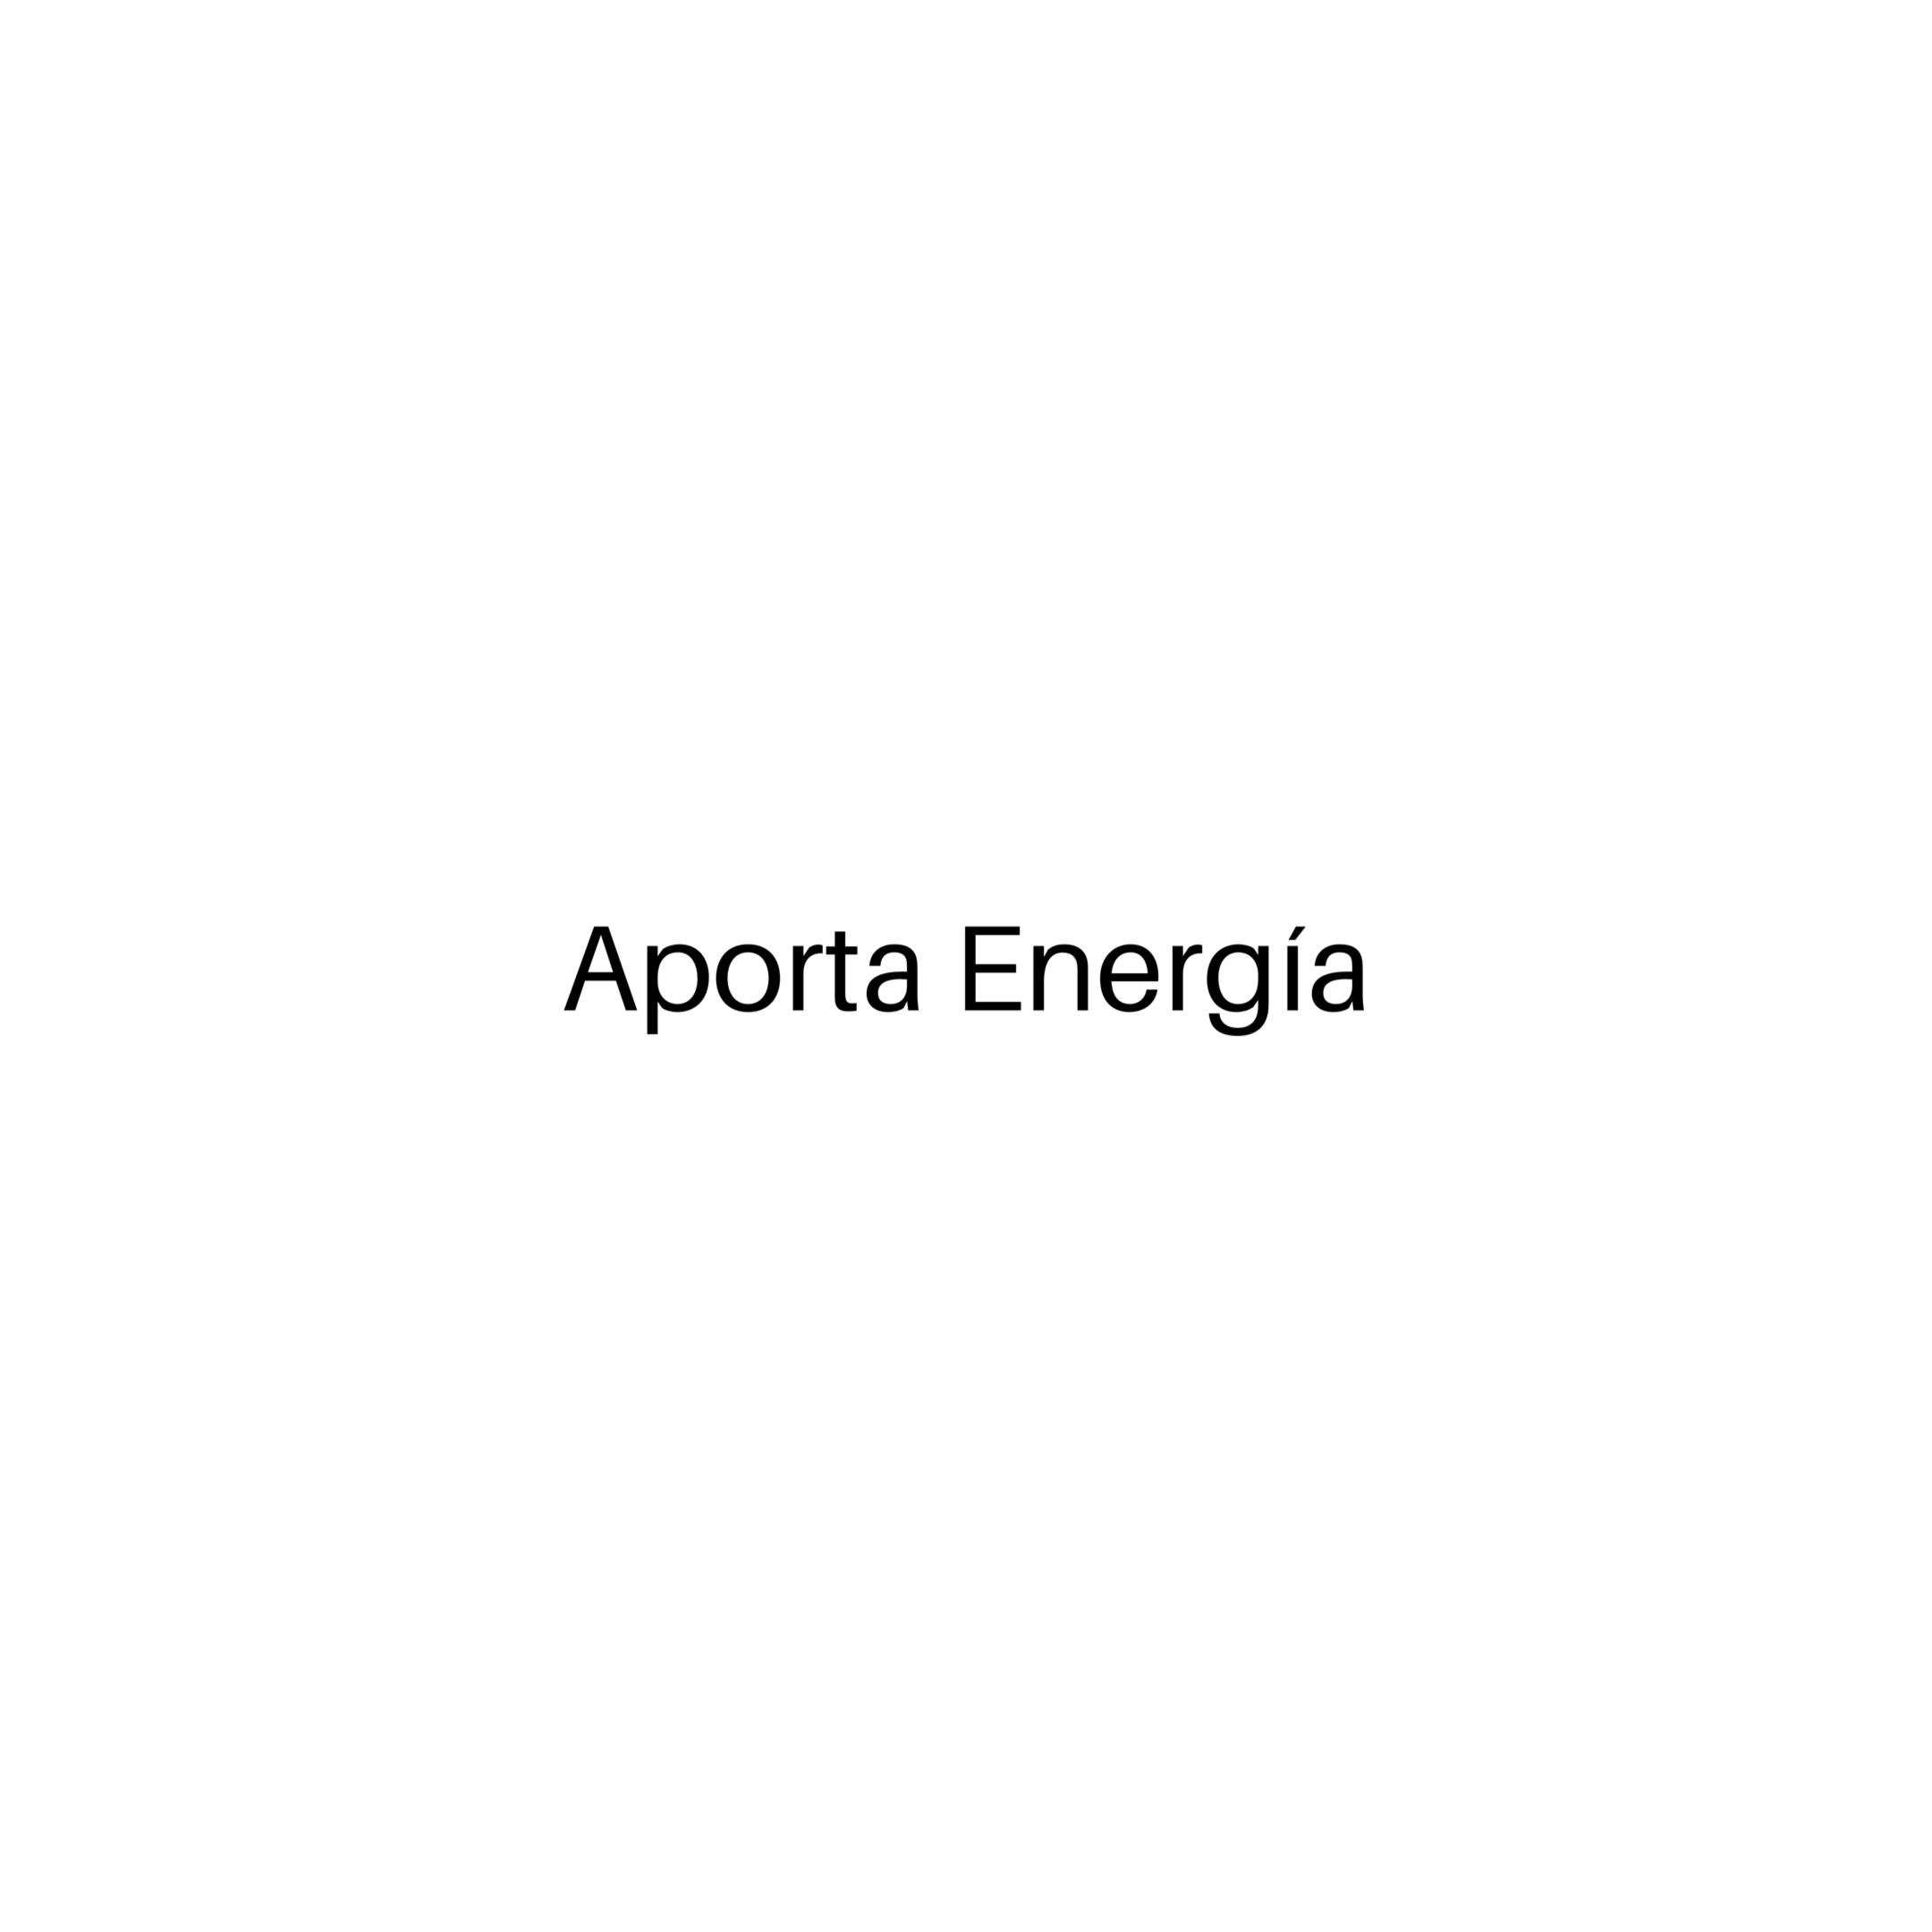 Aporte Energía